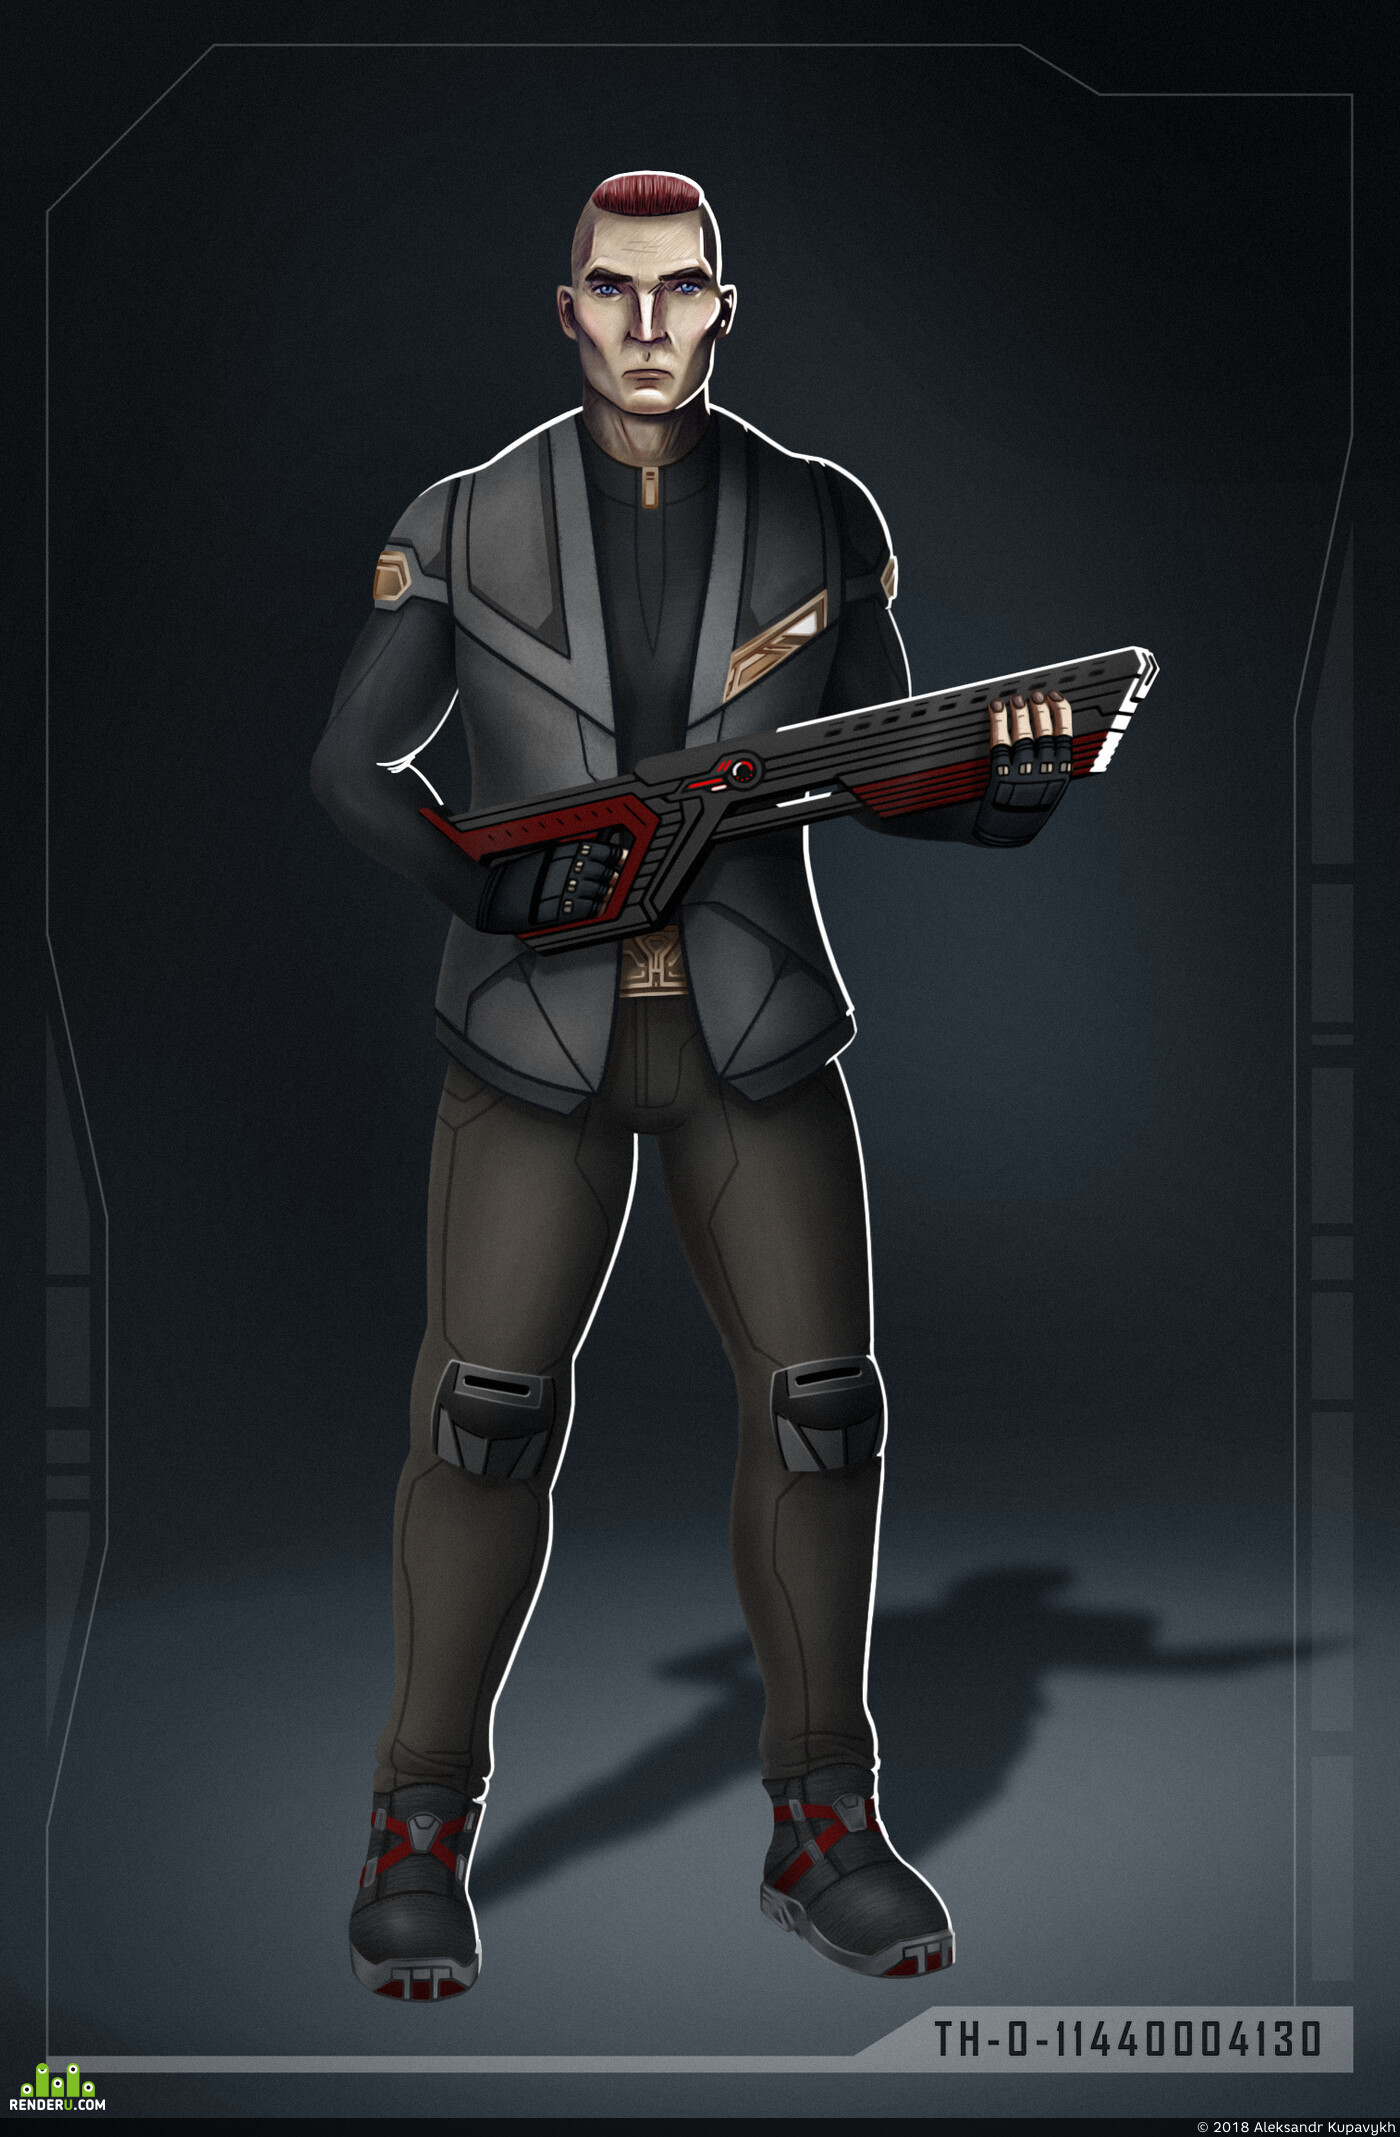 2D, 2dart, Концепт-арт, Концепт Арт, концепт персонажа, киберпанк, sci-fi, concept-art, Character